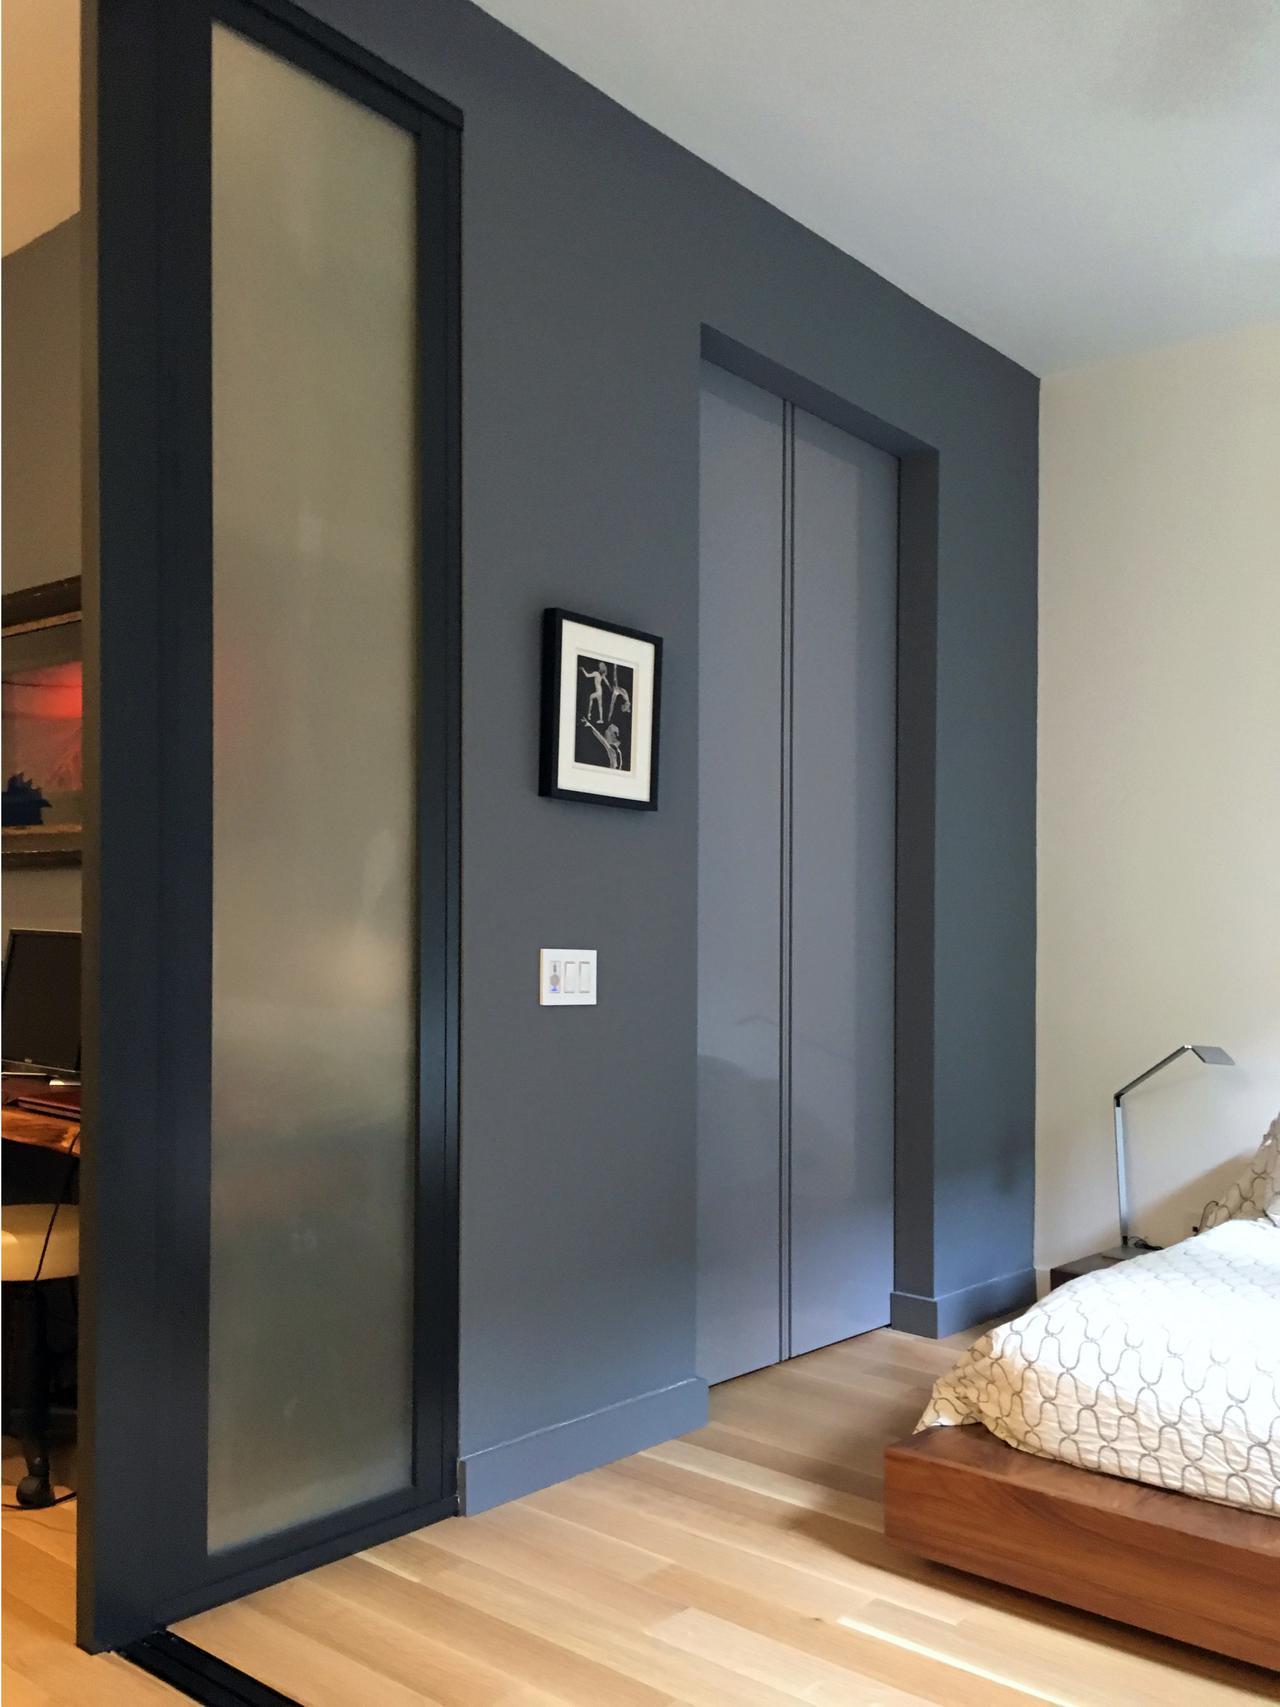 ApartmentNY (9).jpg